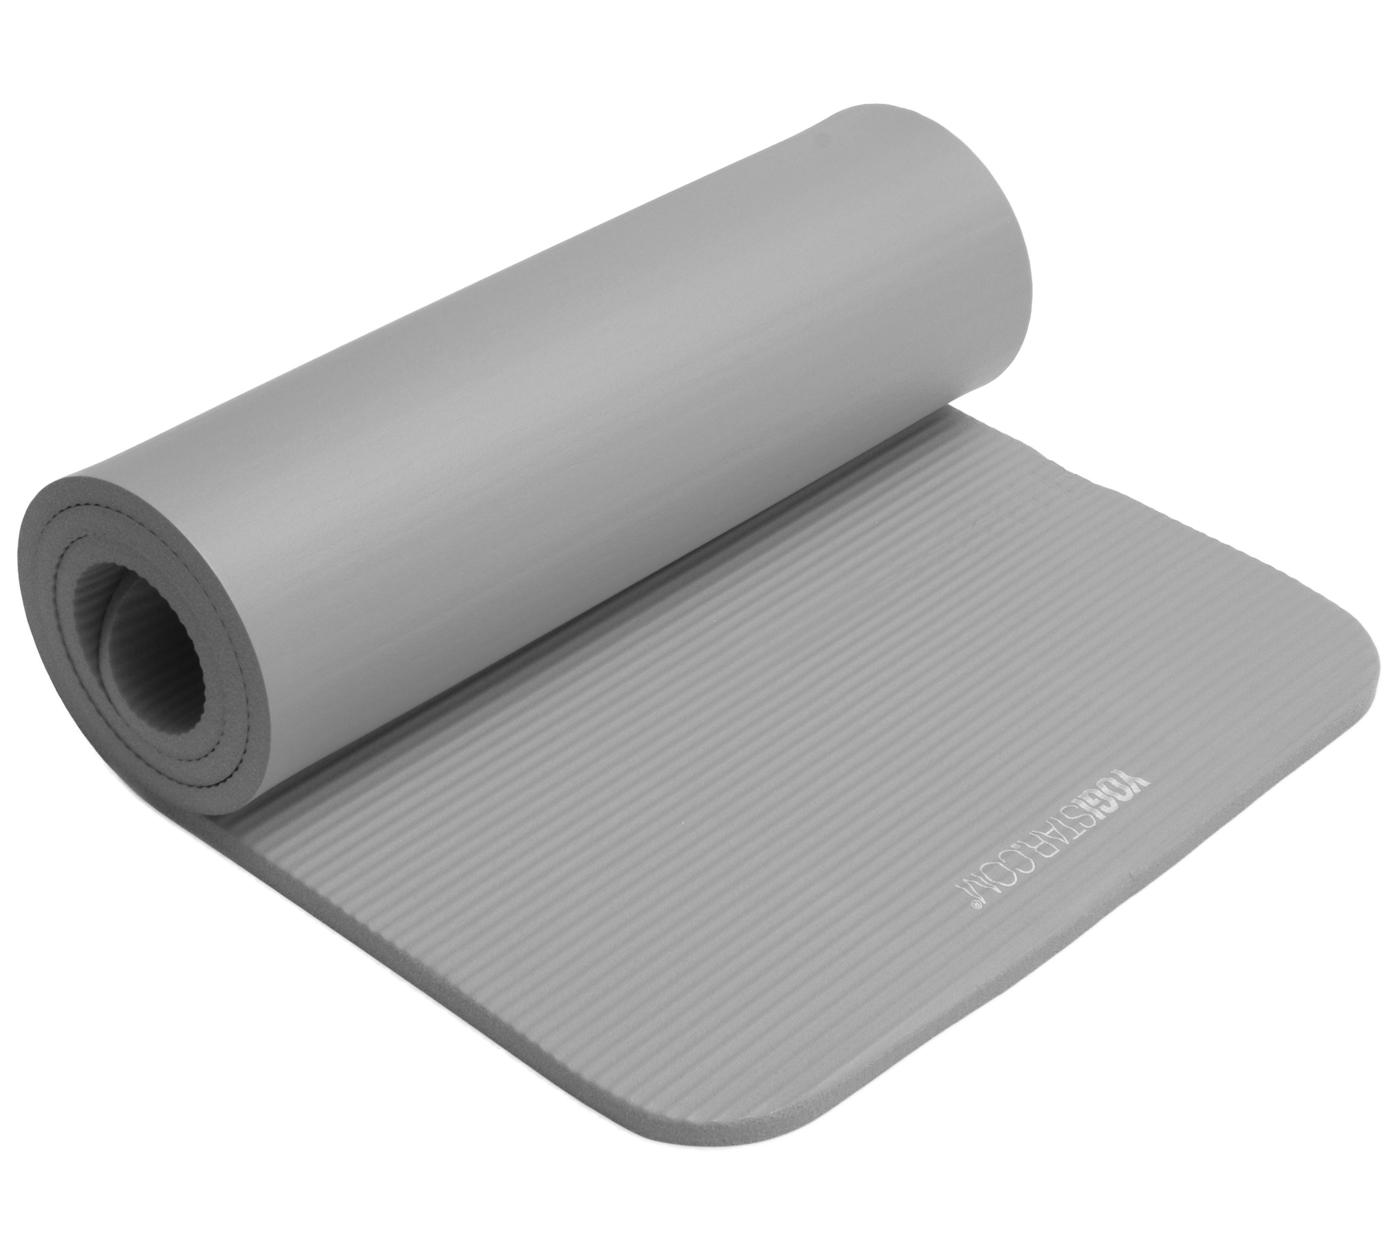 Fitness Mat Gym – 15 Mm Buy Online At YOGISTAR.COM